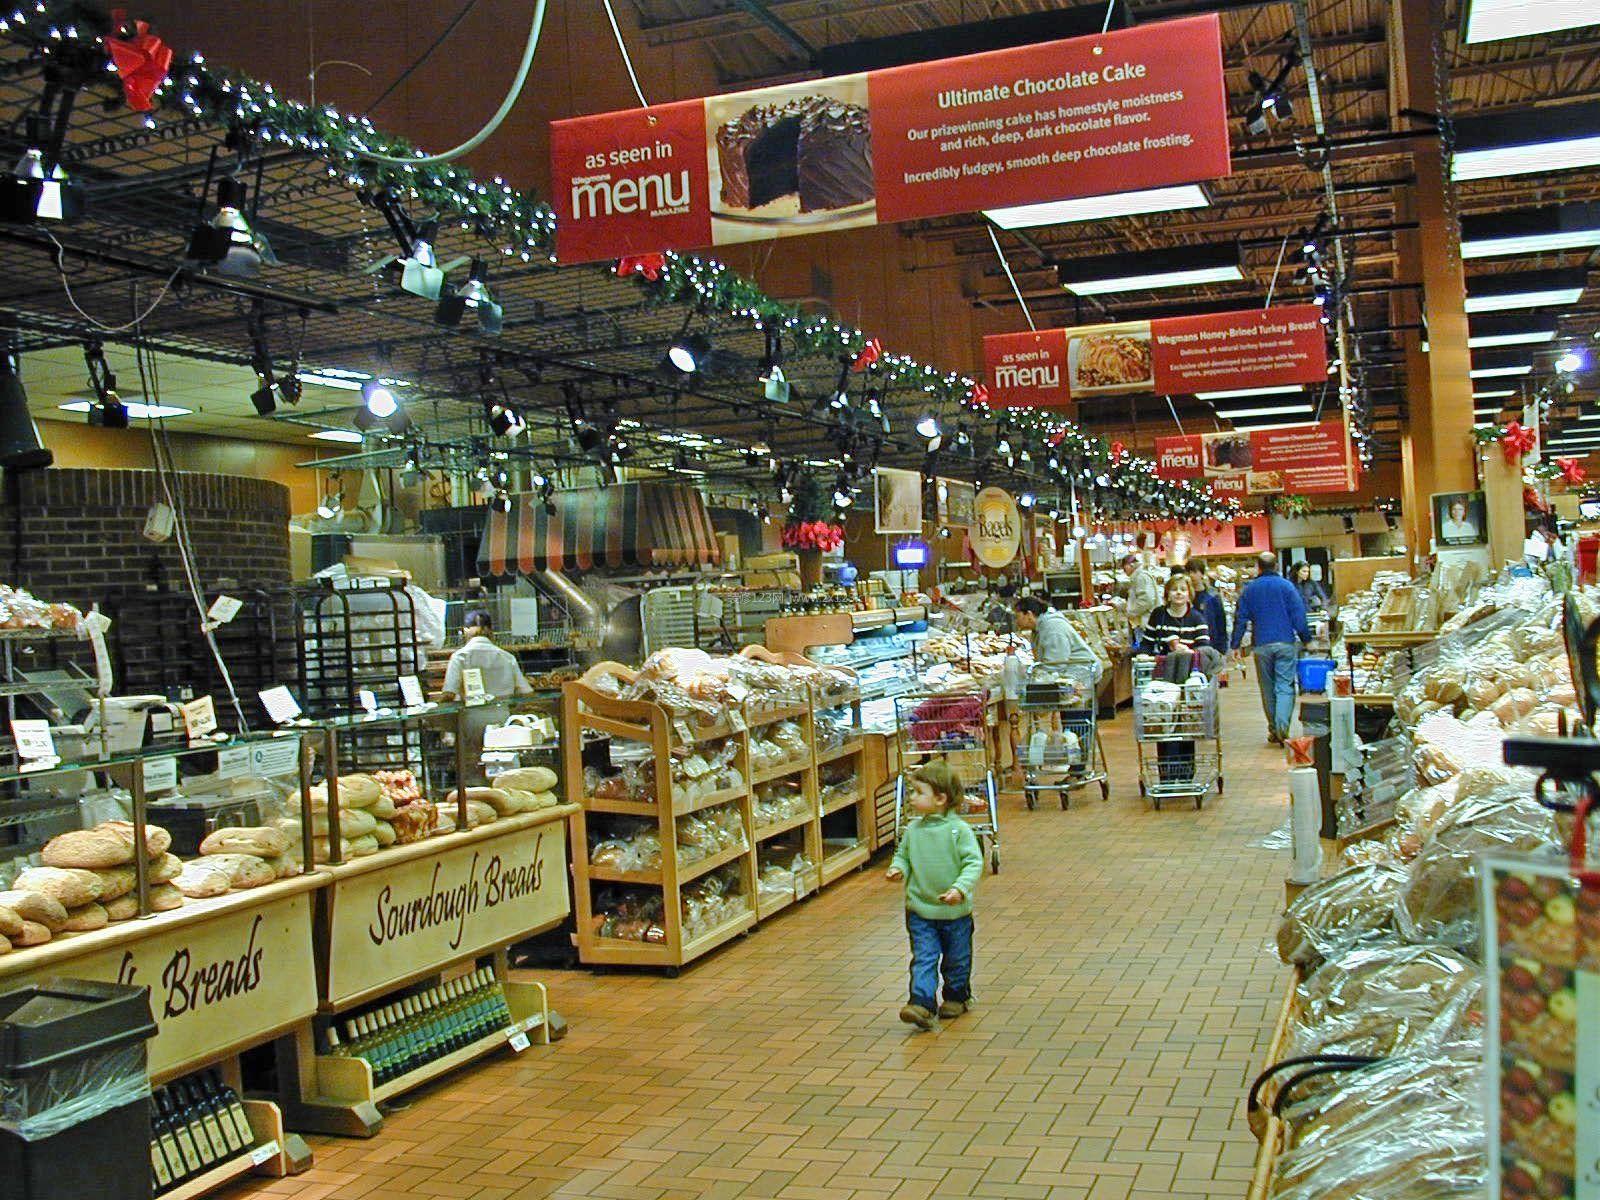 loft风格超市吊顶装修效果图片大全